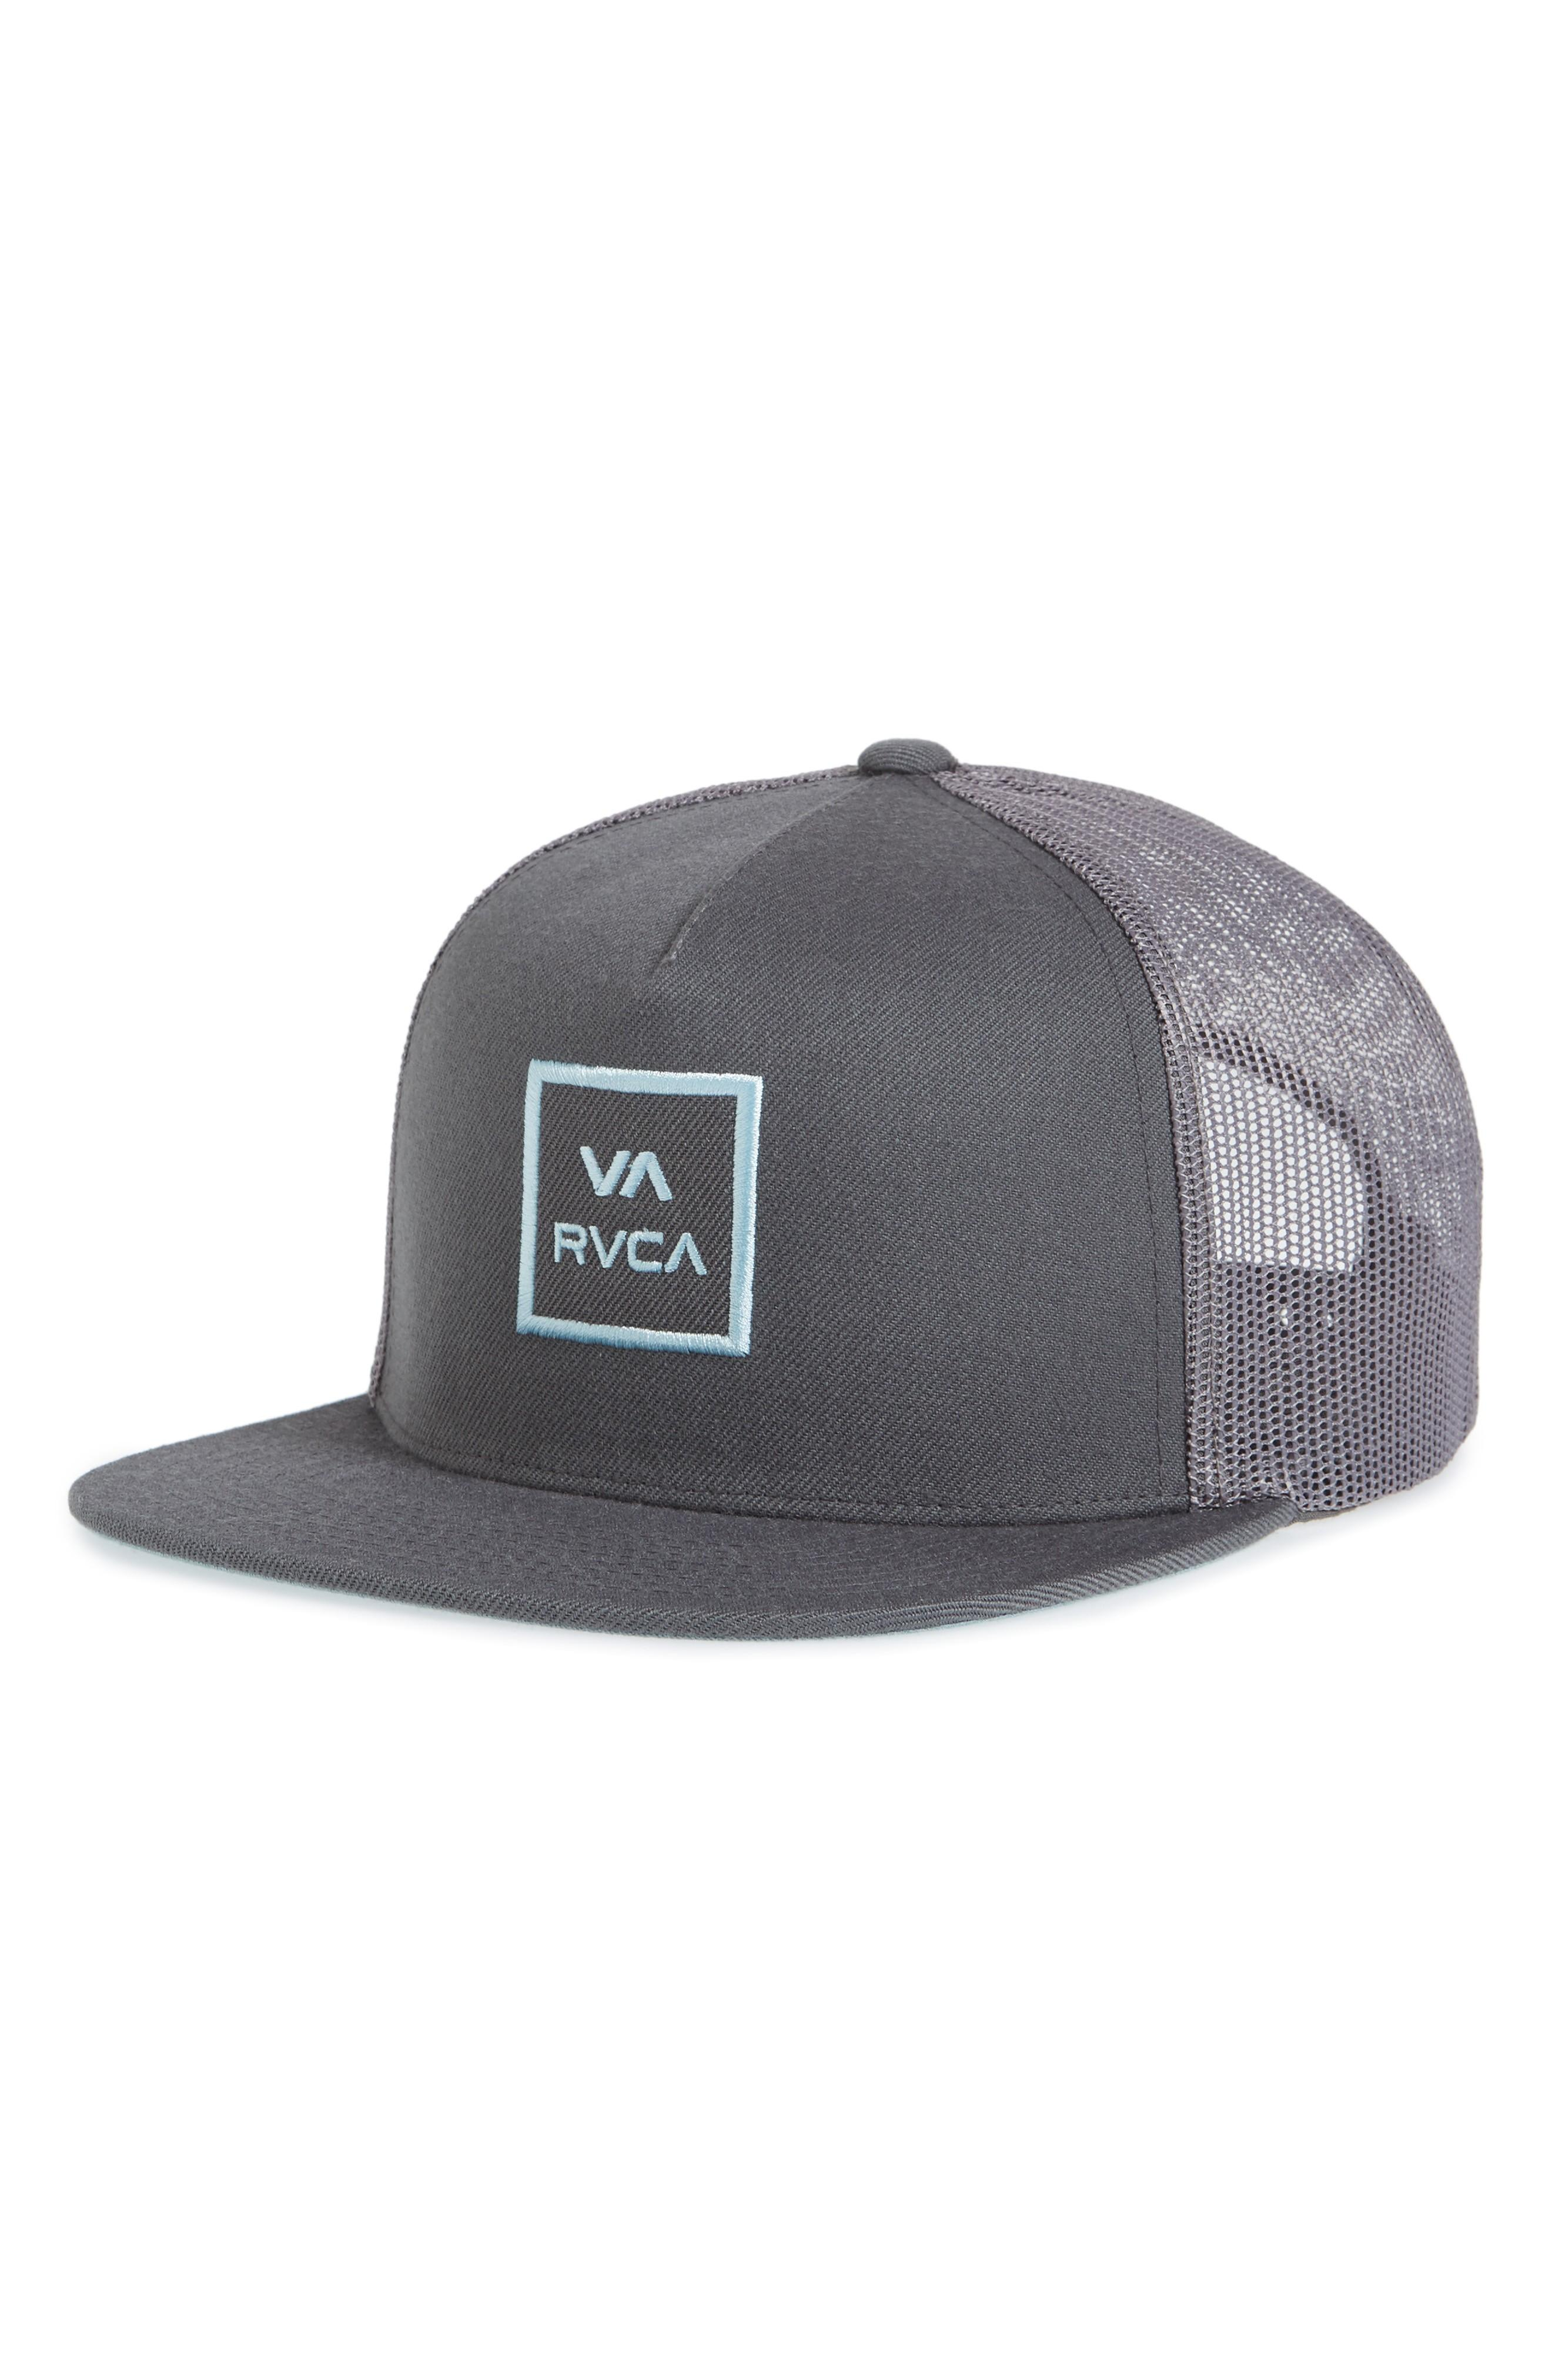 c83216b4fa4b66 Rvca Va All The Way Trucker Hat - Grey In Dark Grey | ModeSens